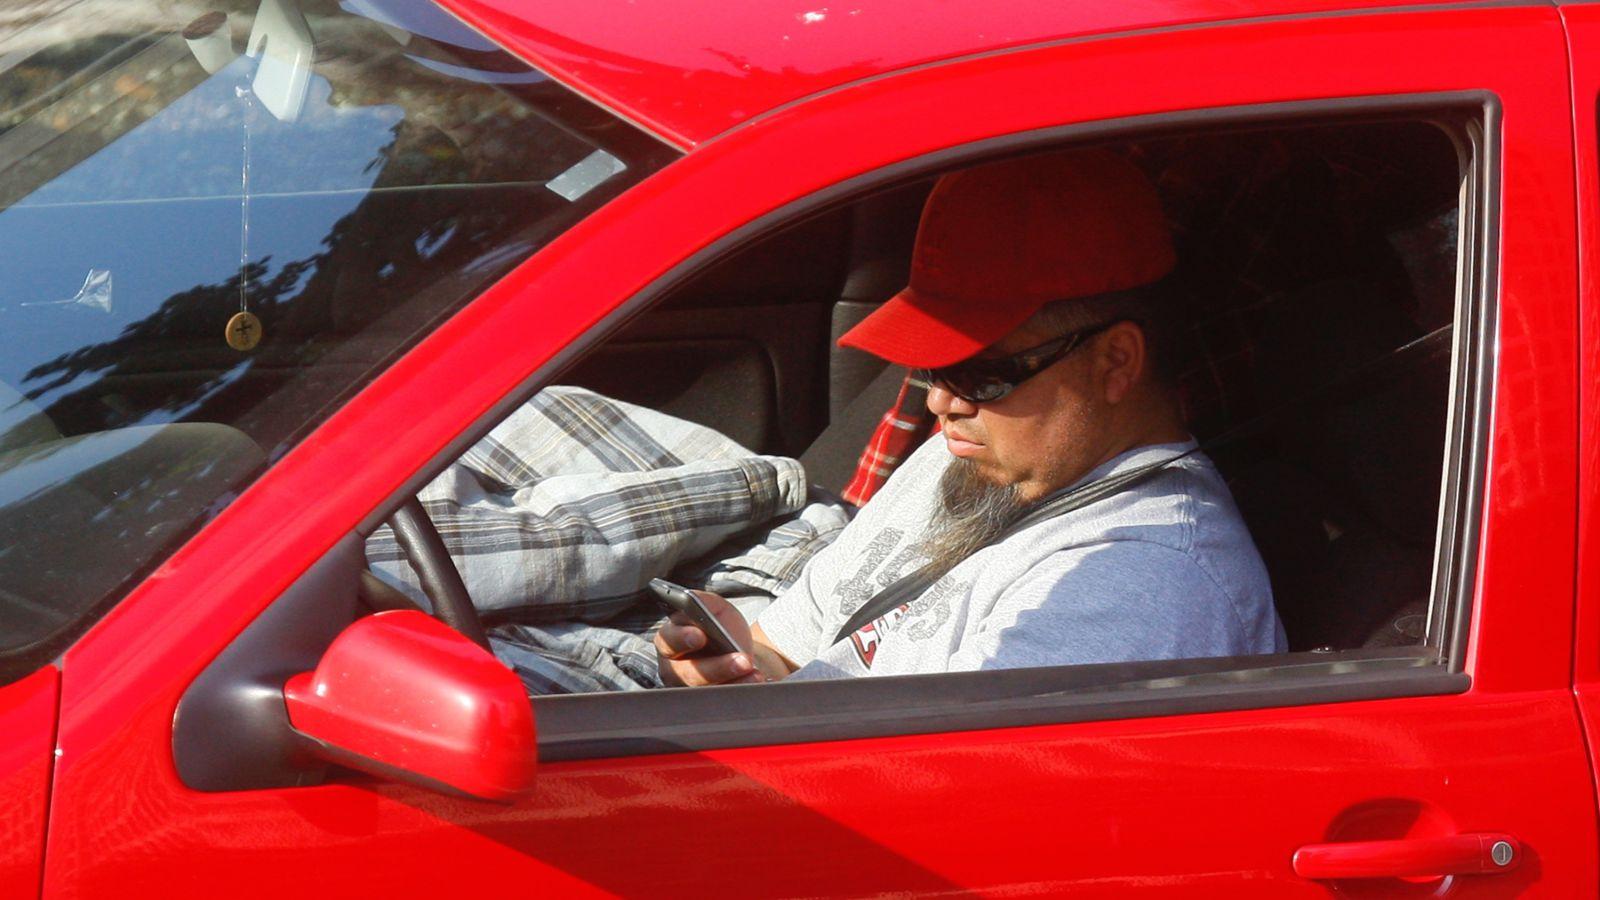 intel, texting and driving, security camera, distracted driving, movidius, hikvision